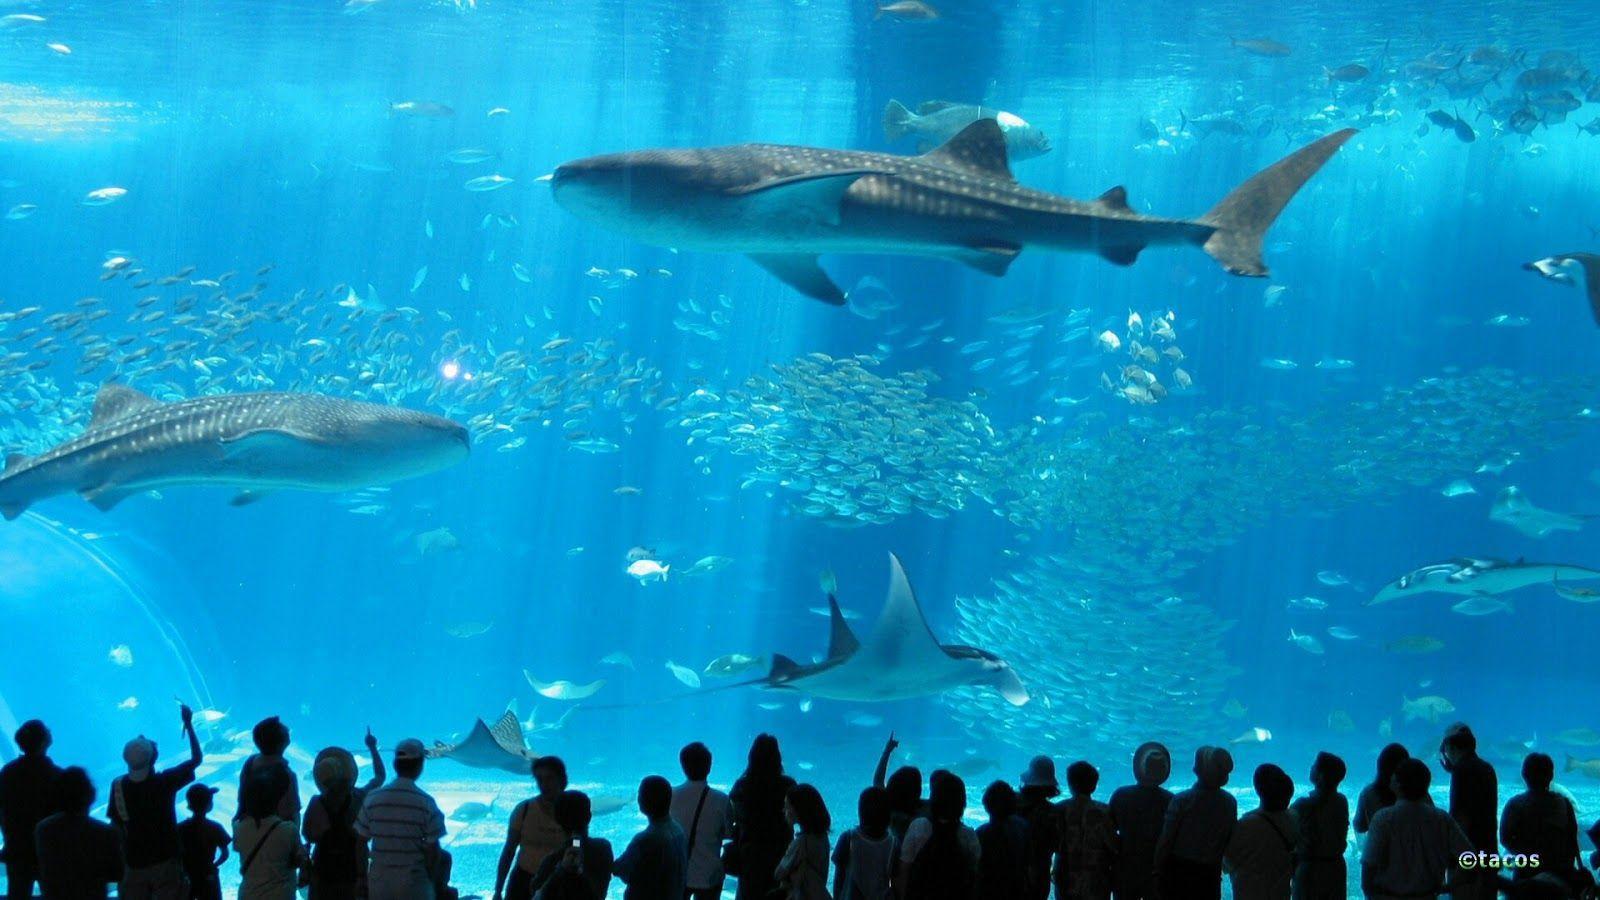 Japanese Aquarium Wallpapers Top Free Japanese Aquarium Backgrounds Wallpaperaccess